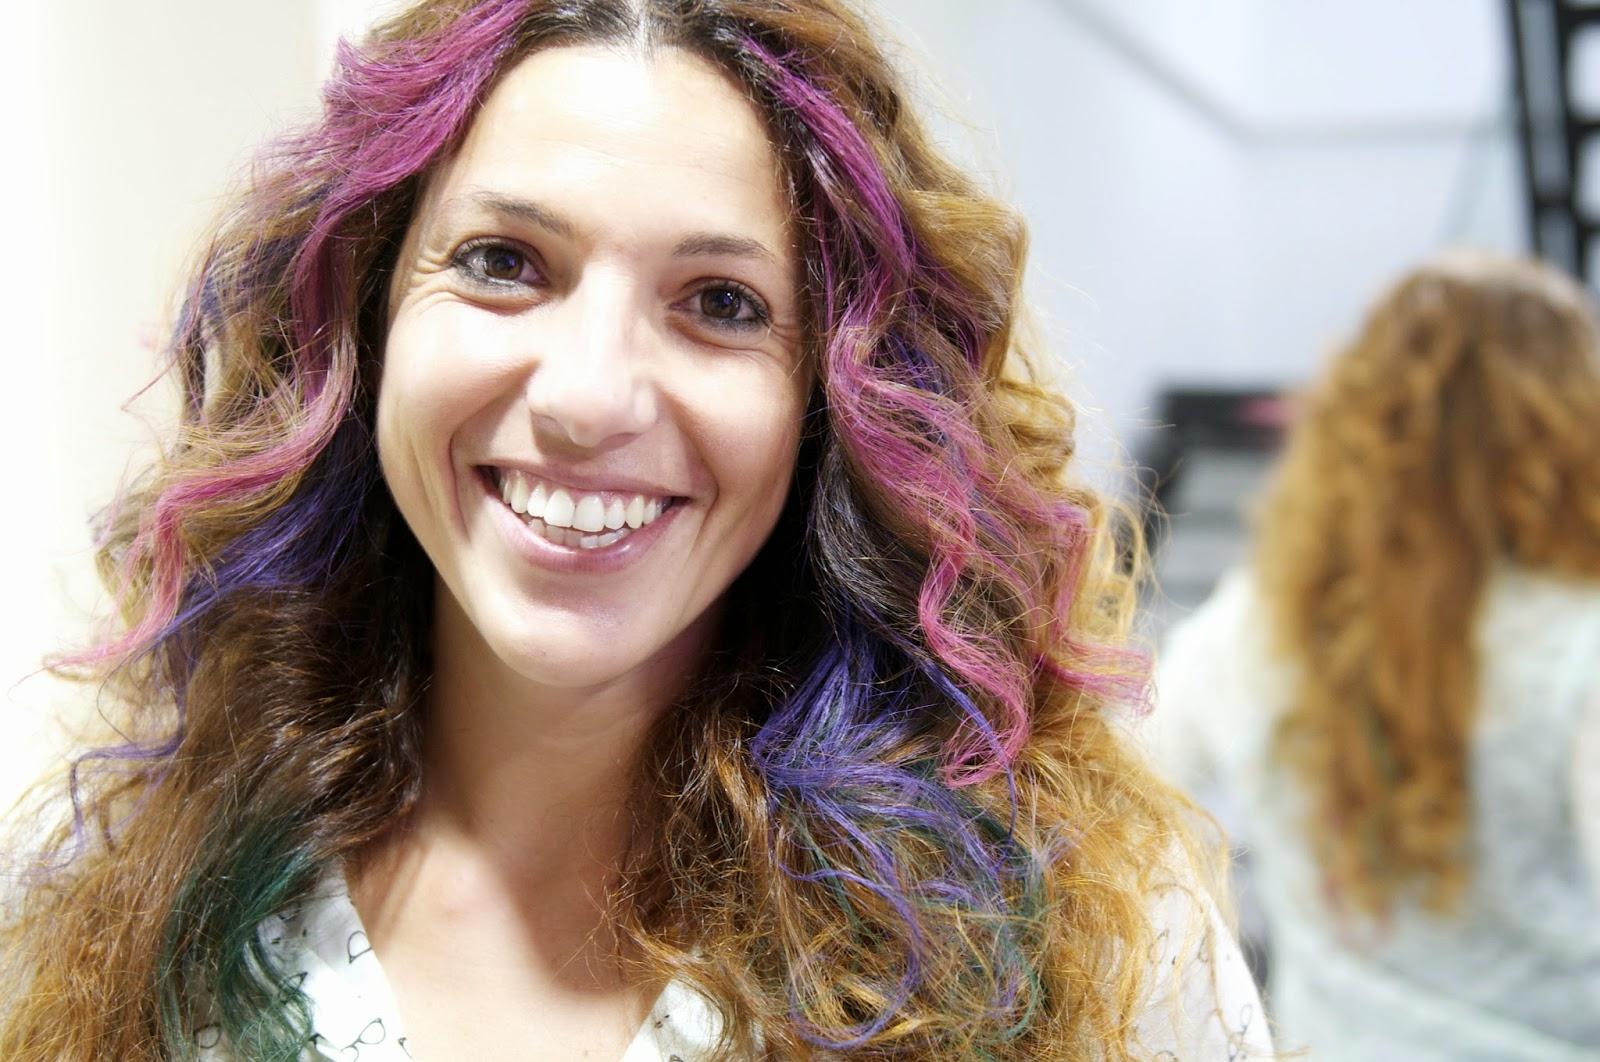 Peinados Faciles Para Navidad - Peinados Para Las Fiestas De Navidad Peinados Faciles y